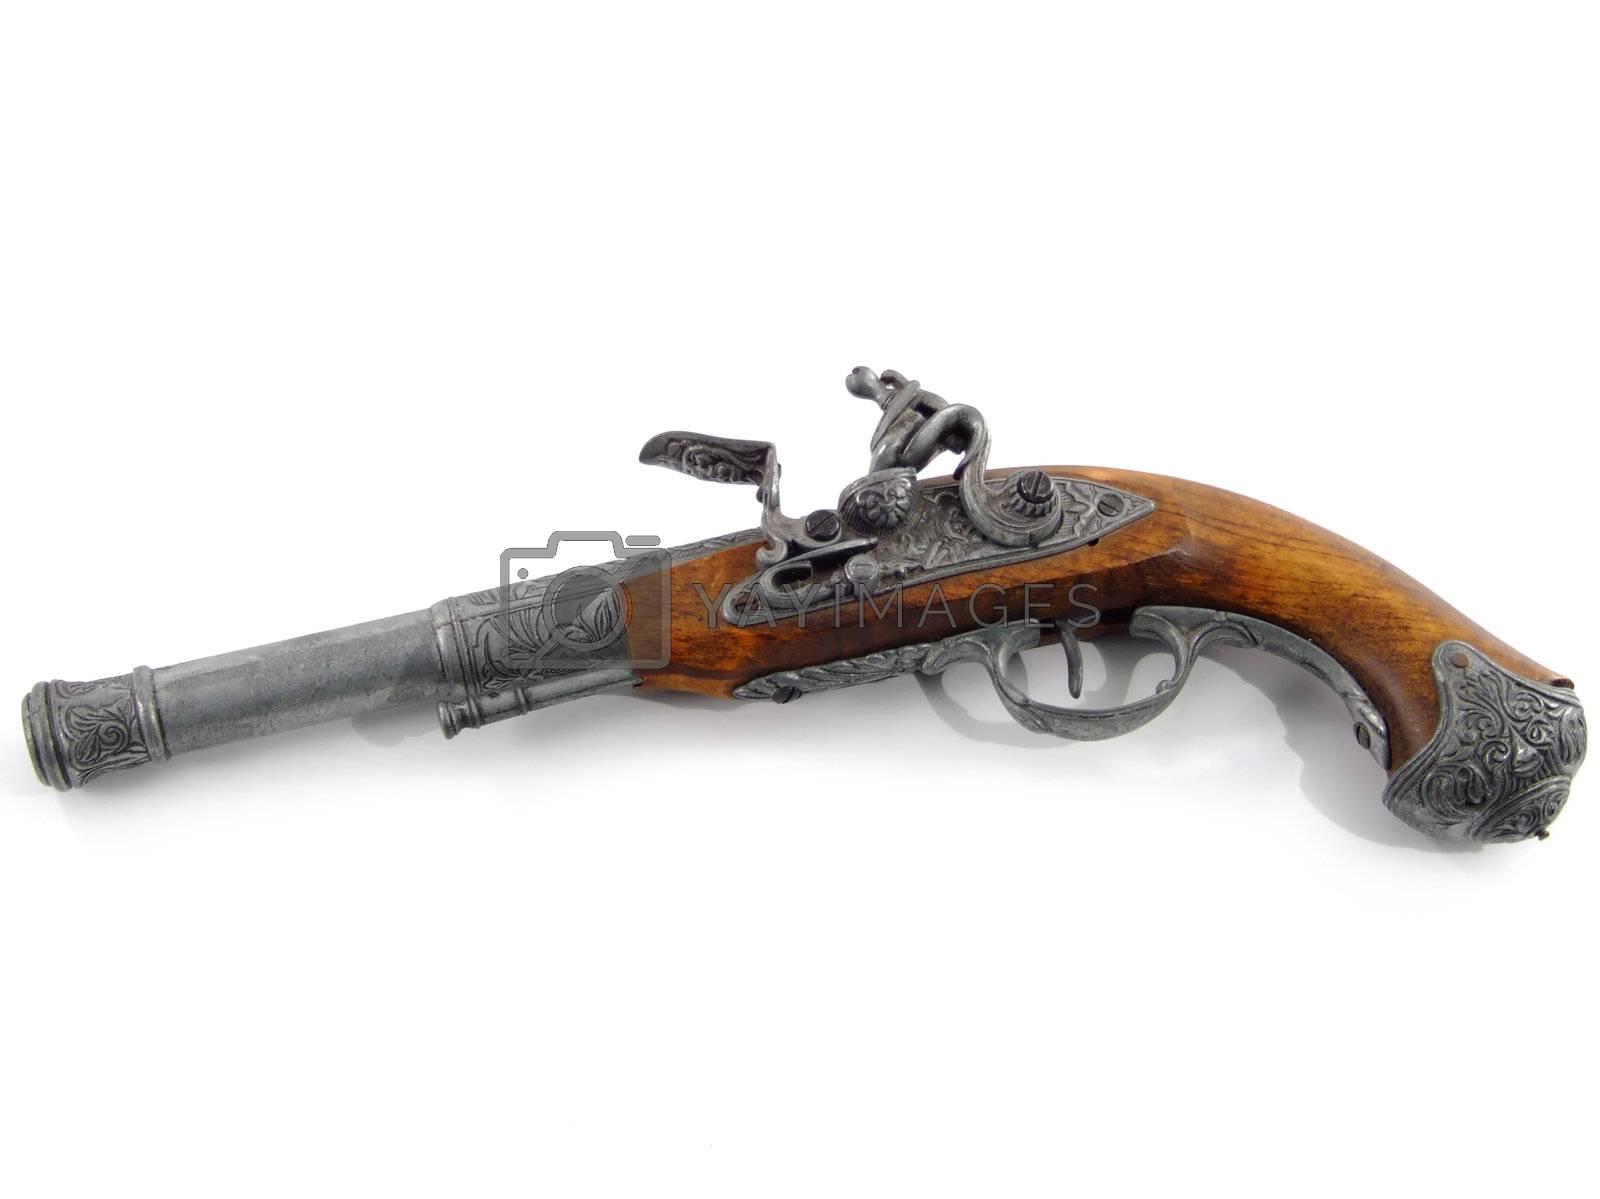 Old gun by PauloResende